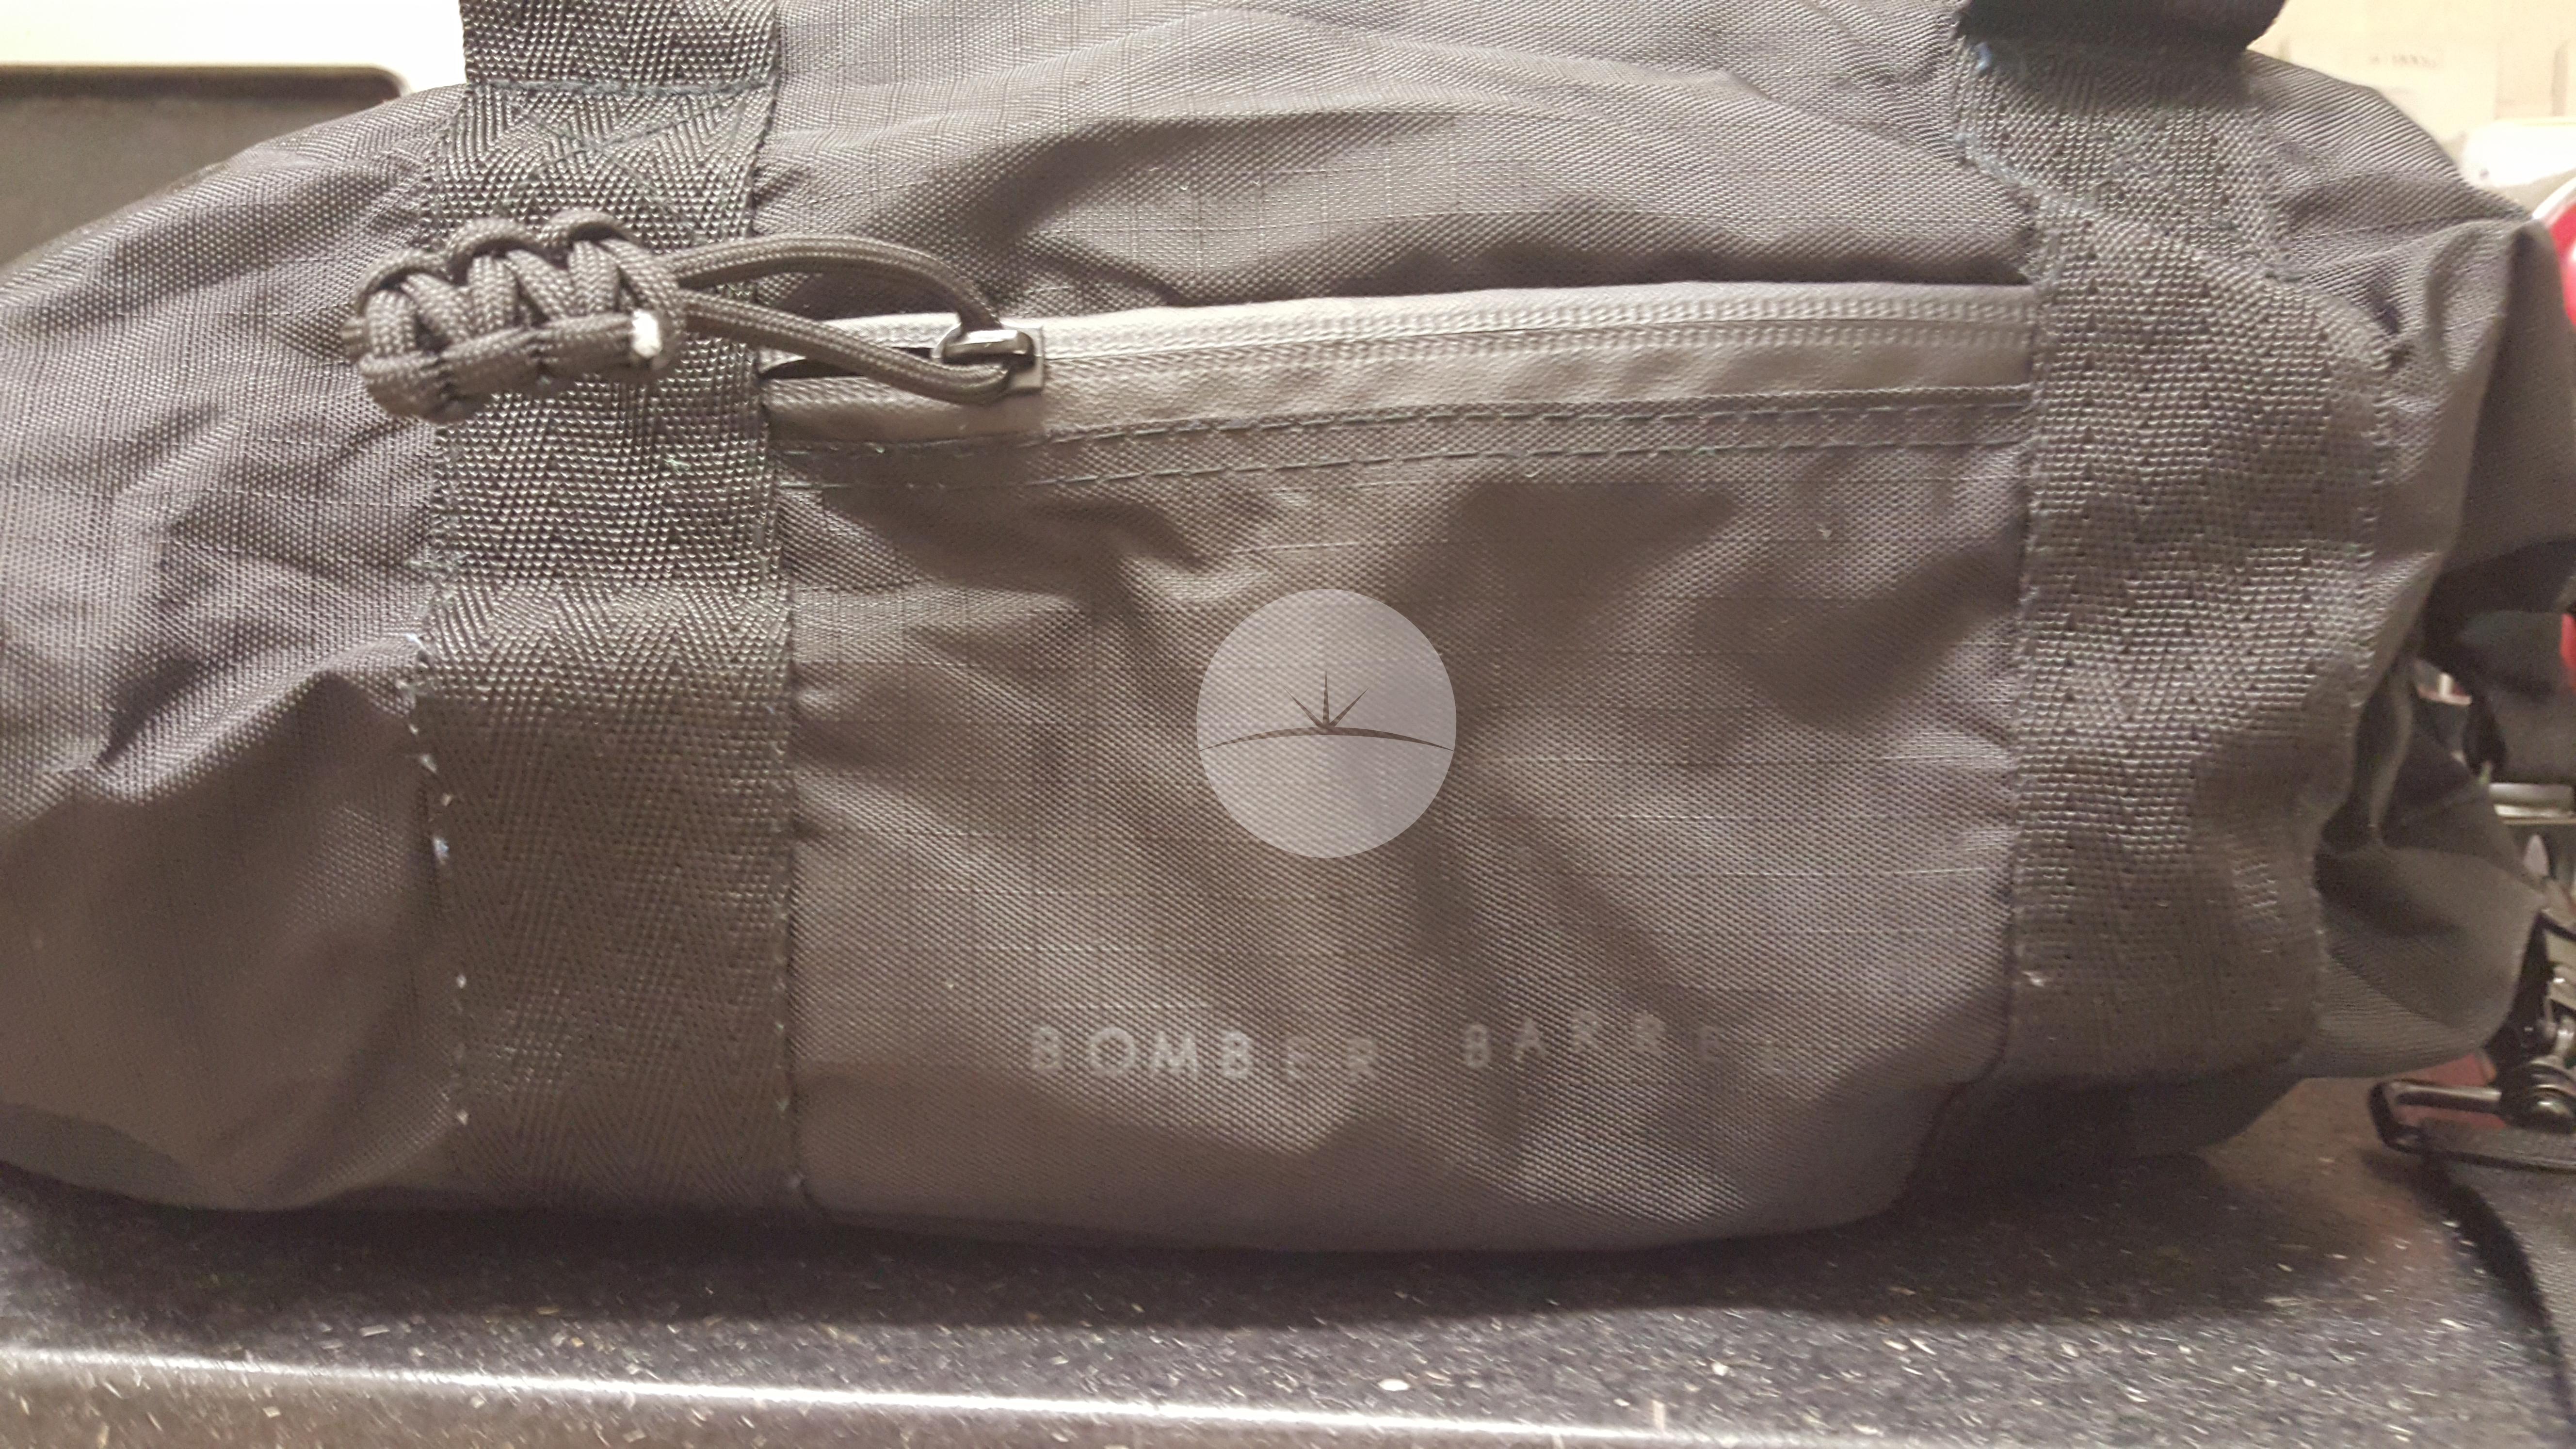 Review bomber barrel duffle bag complete set for Bomber bag review